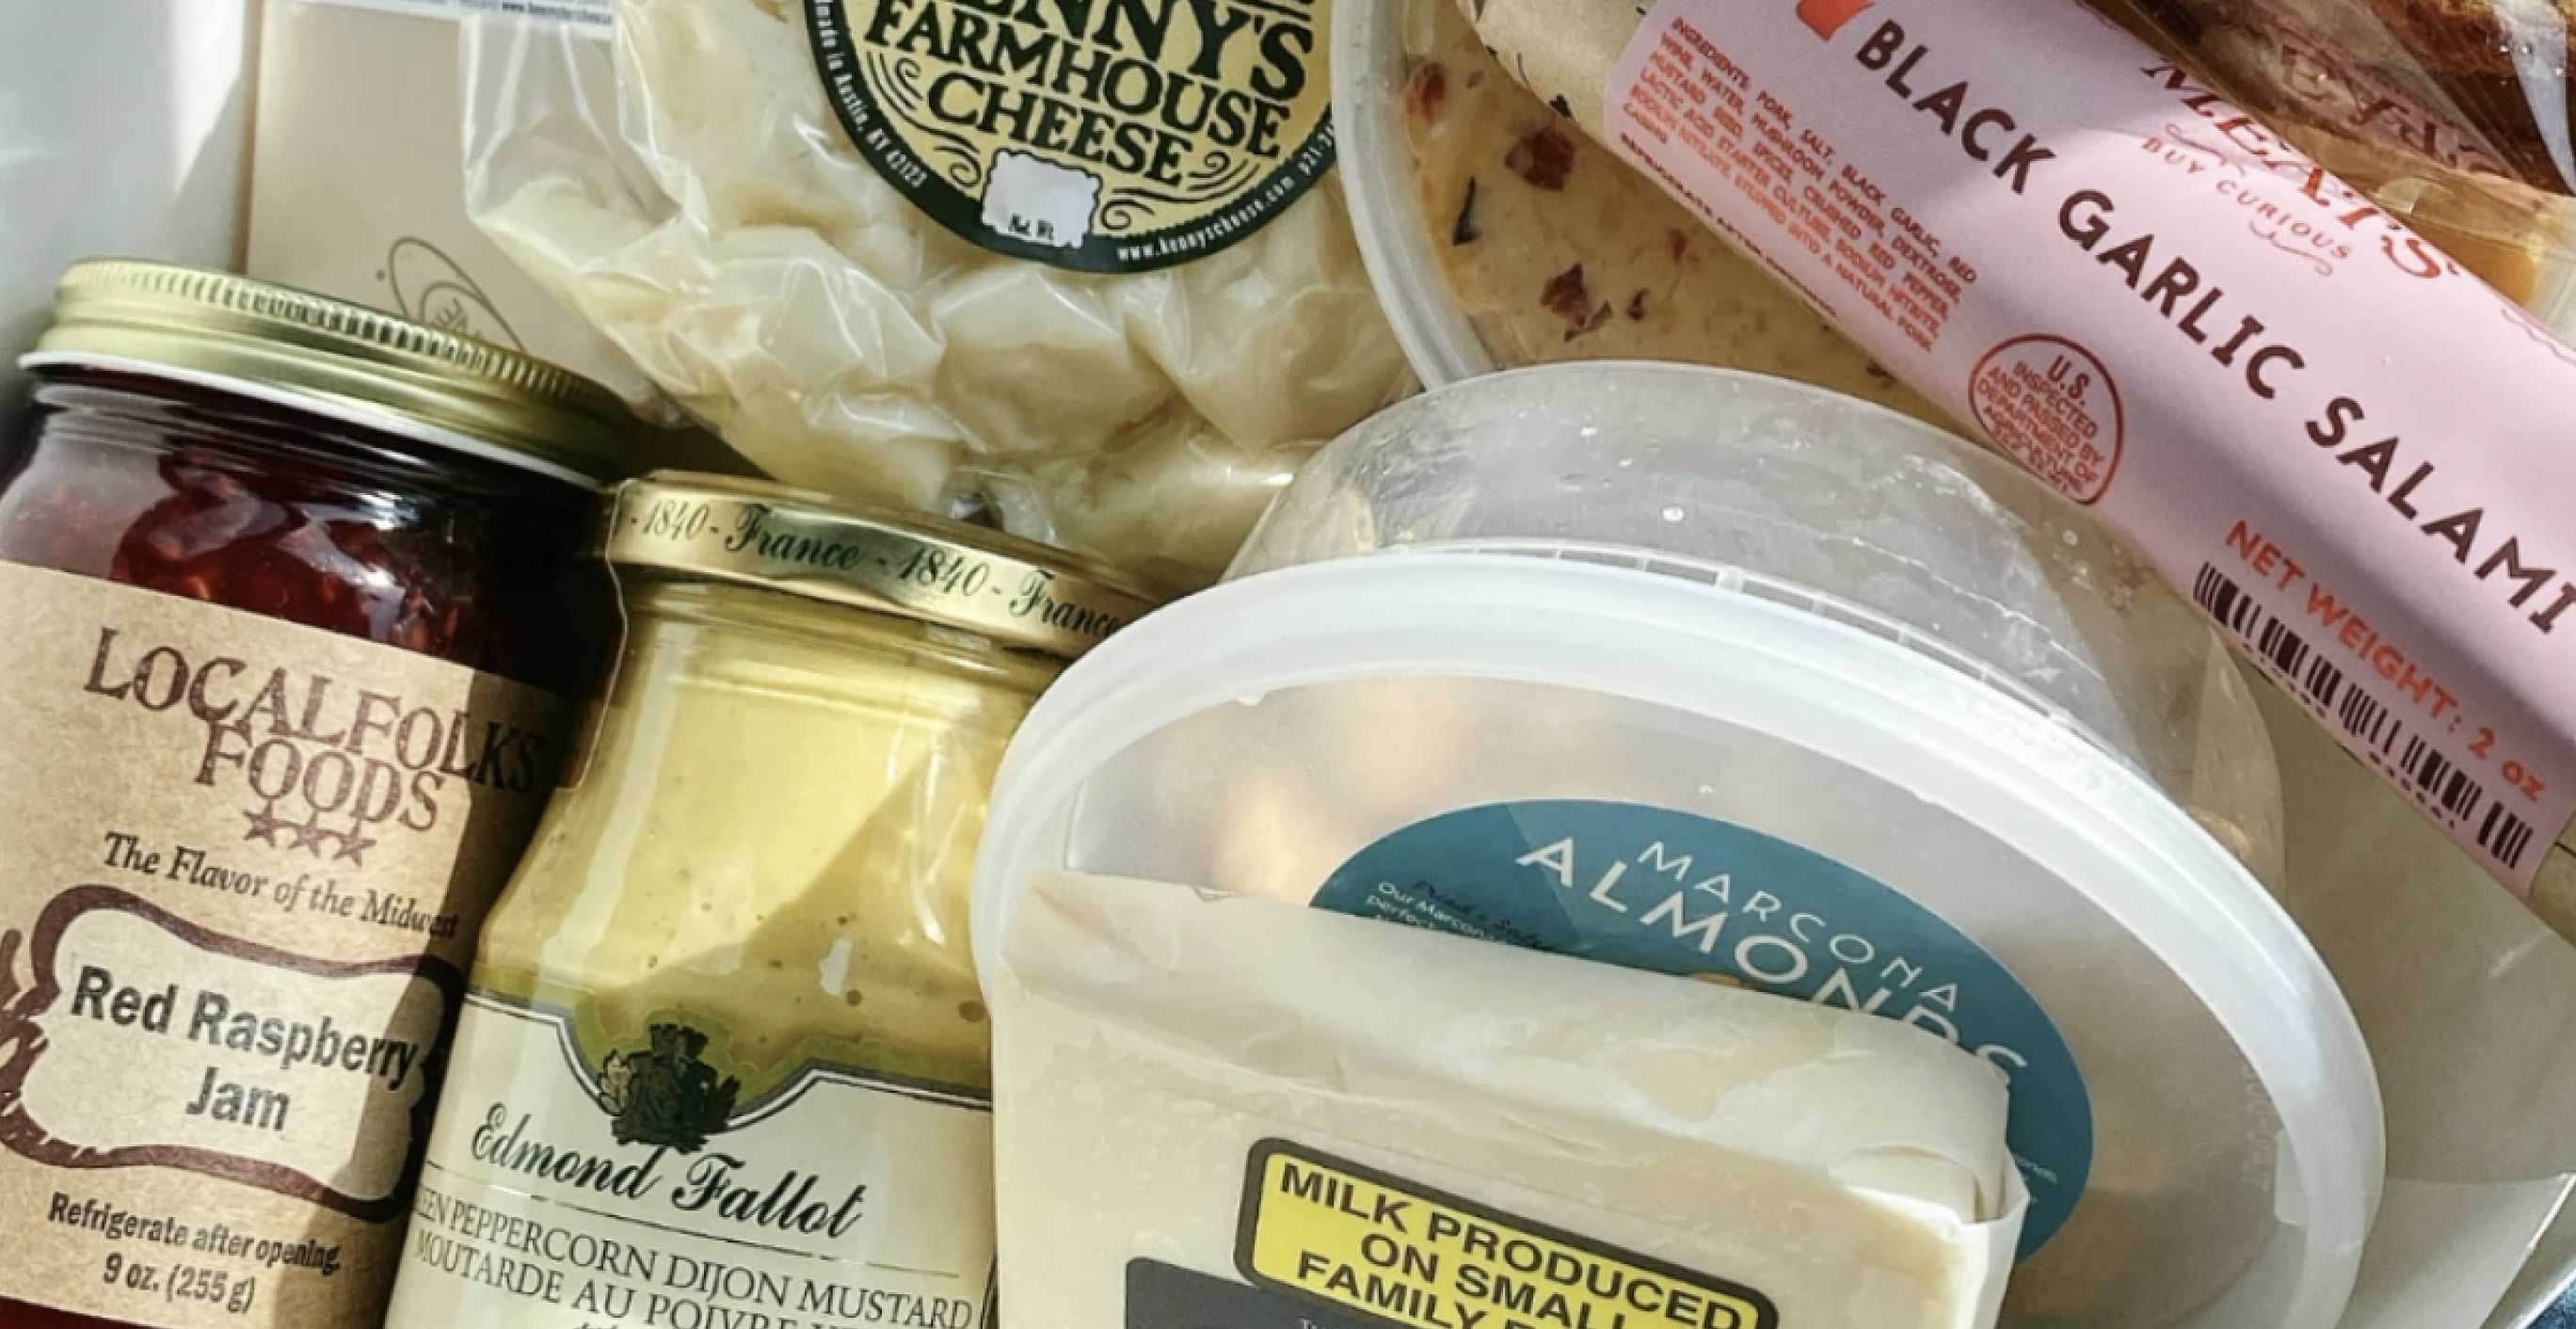 Harvey's Cheese Gift Box